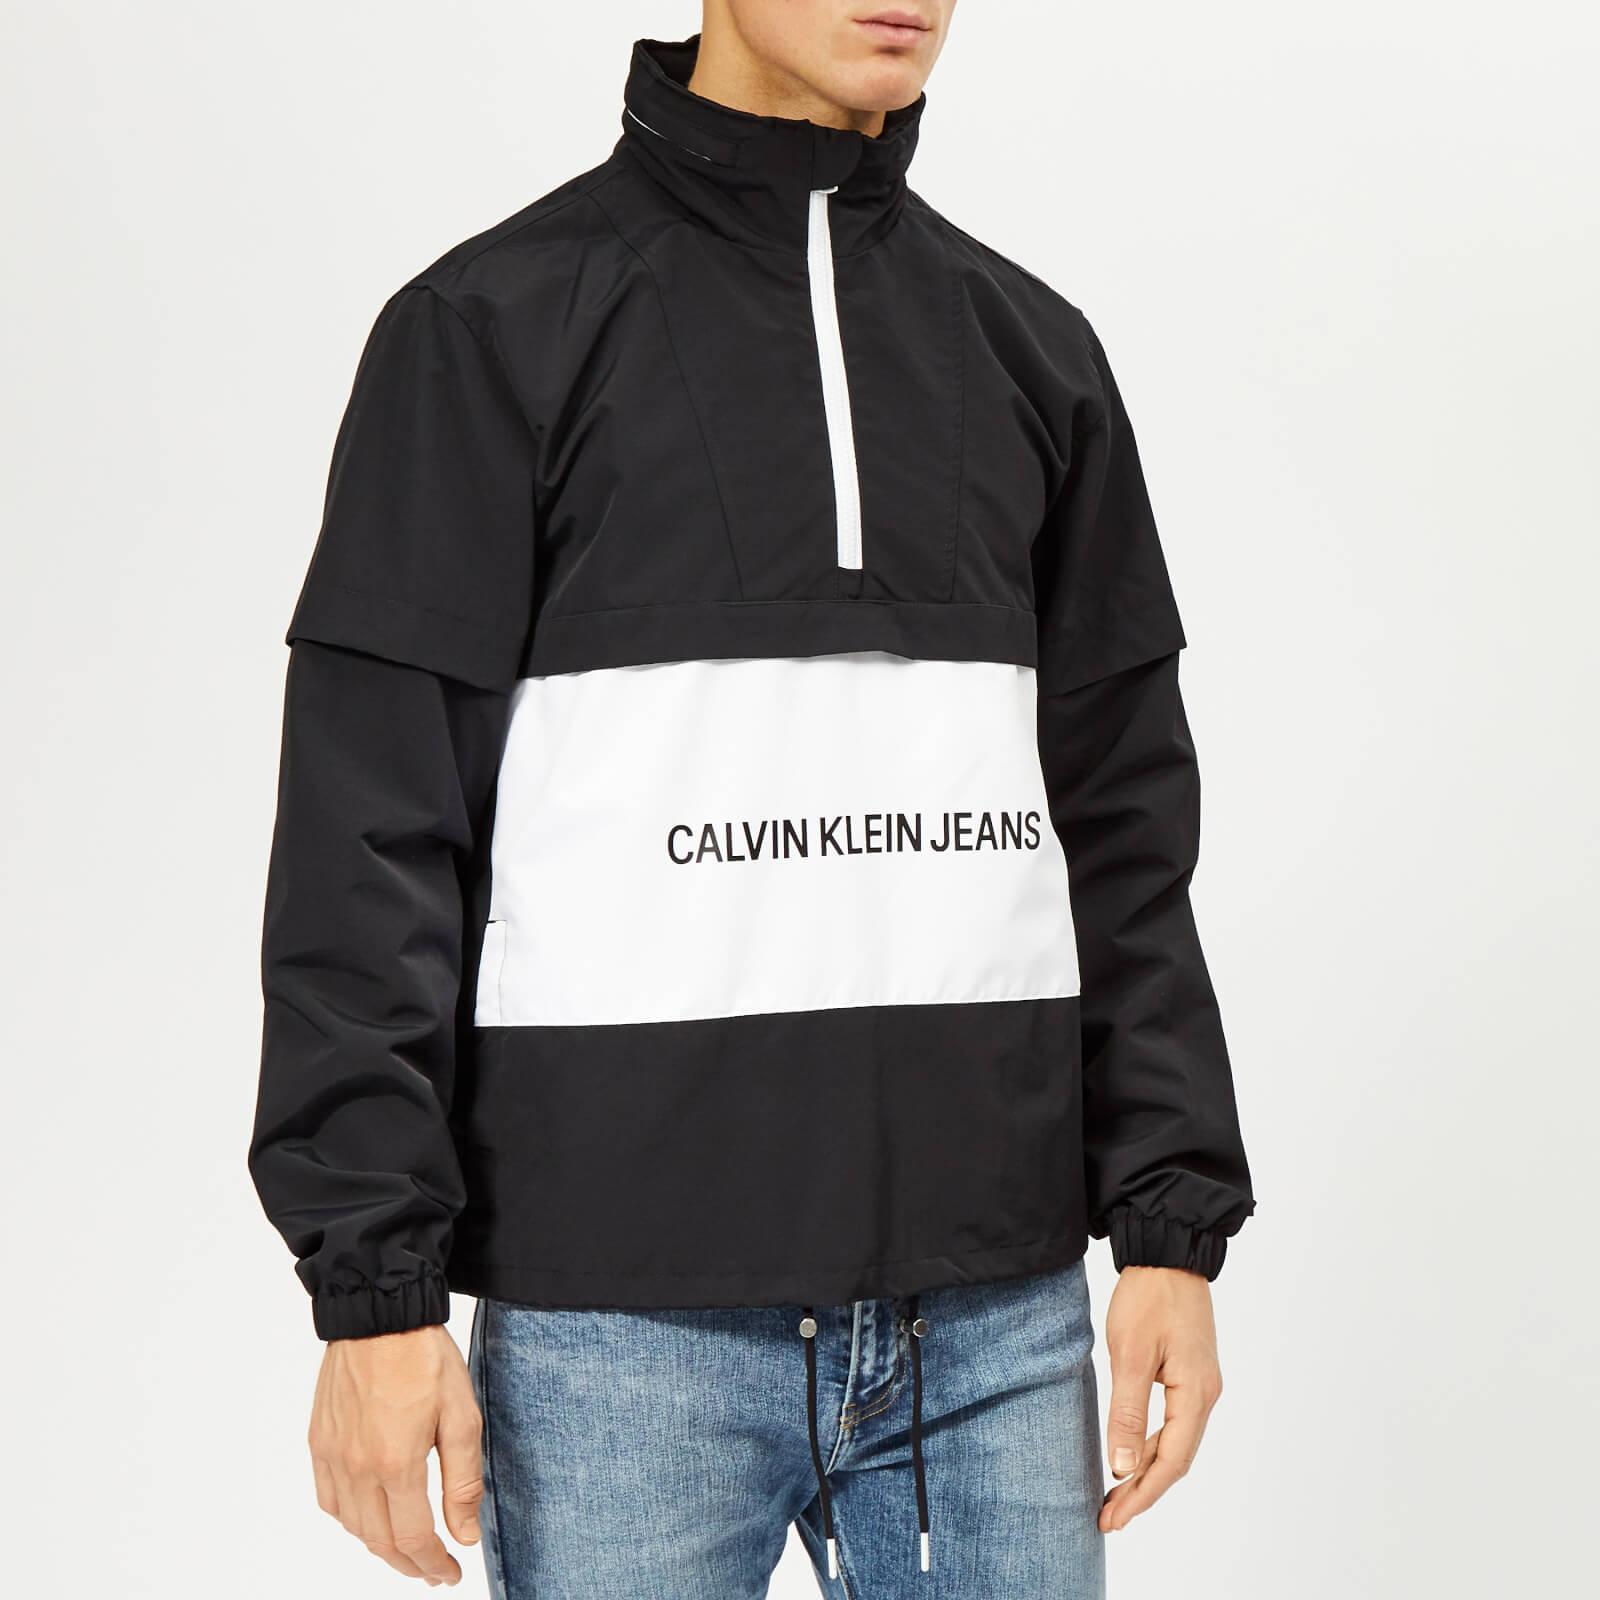 CALVIN KLEIN JEANS Check logo nylon